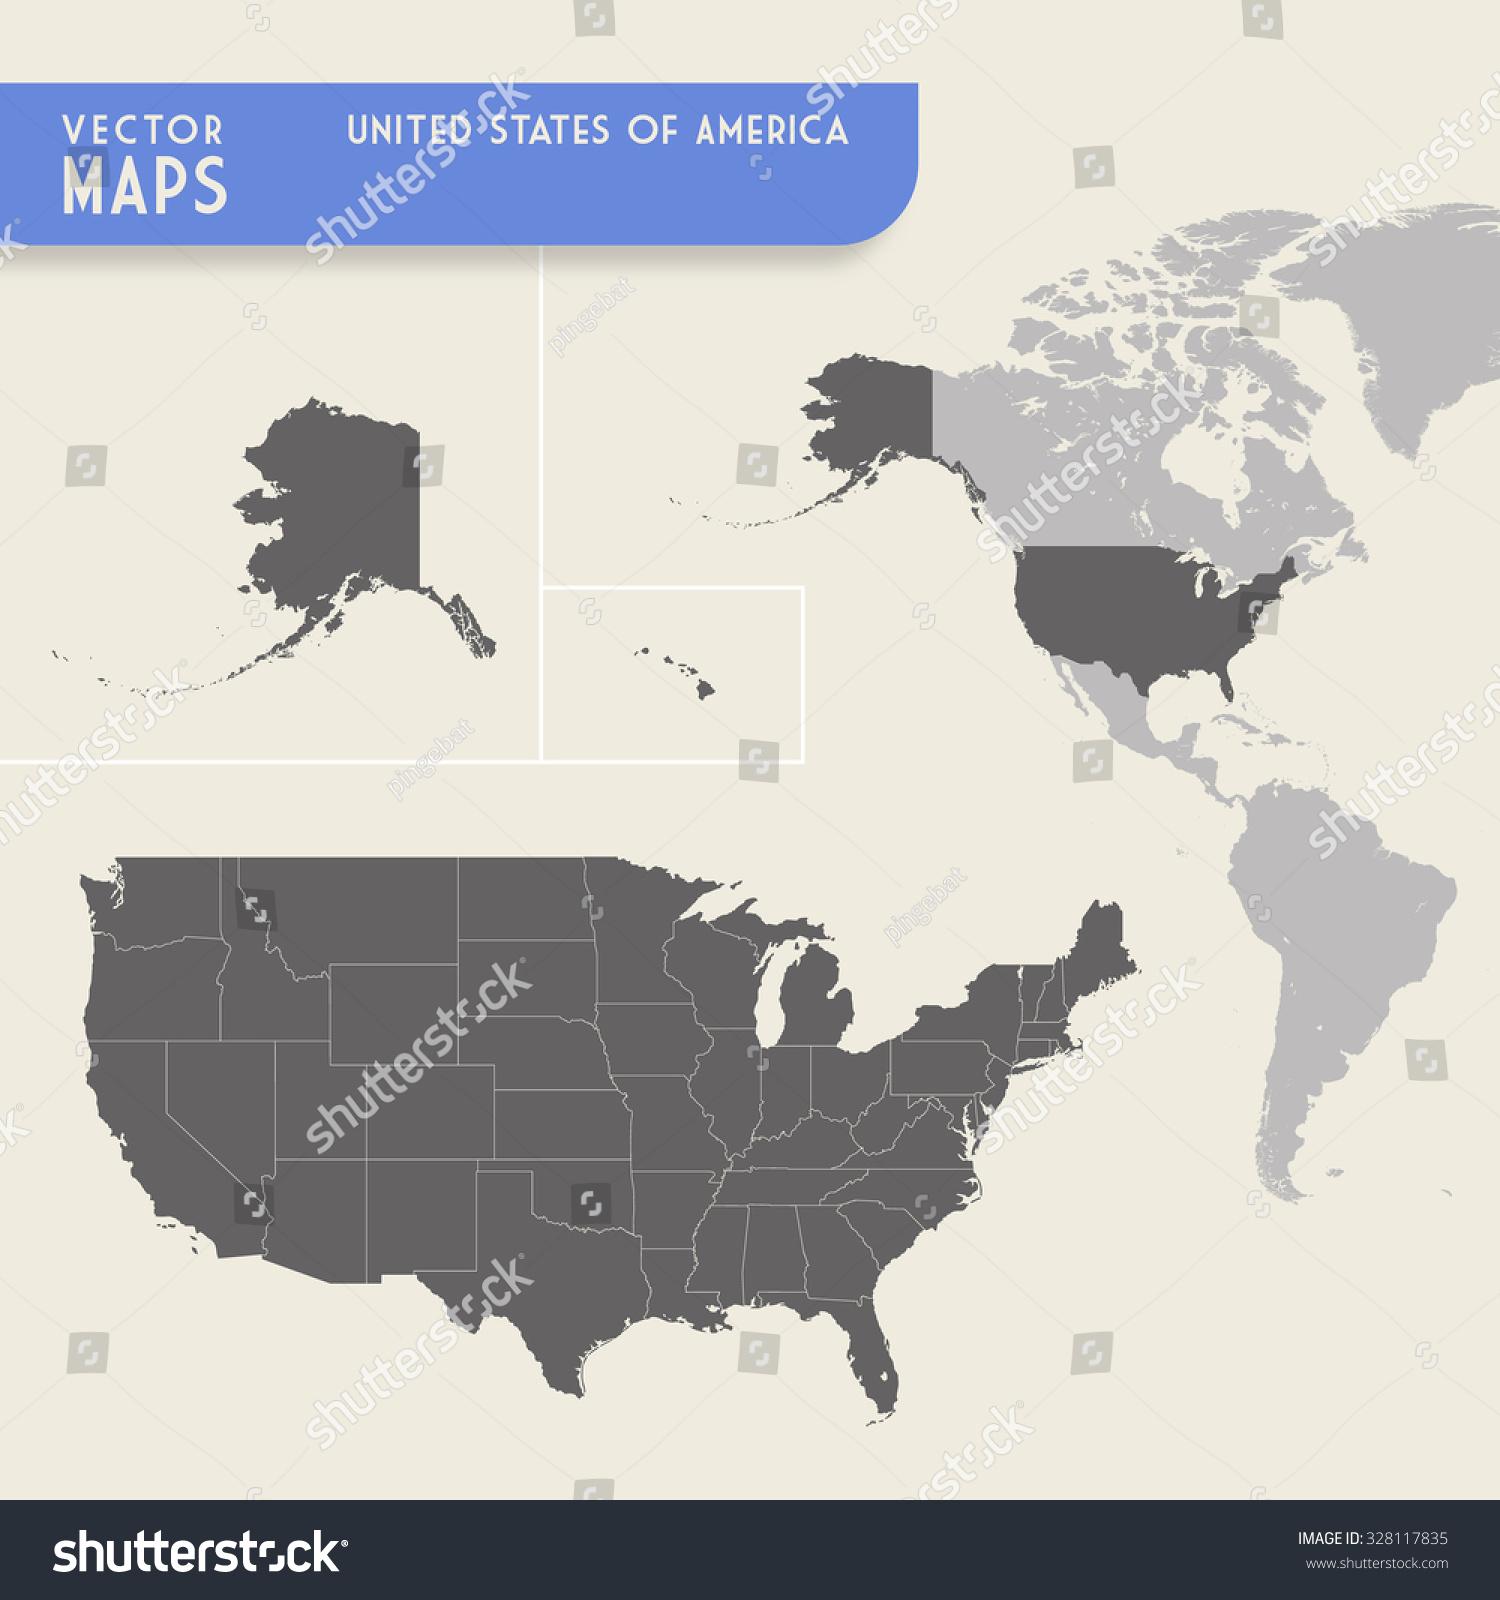 Vector Map United States America Minimap Stock Vector - Map of the united states continents